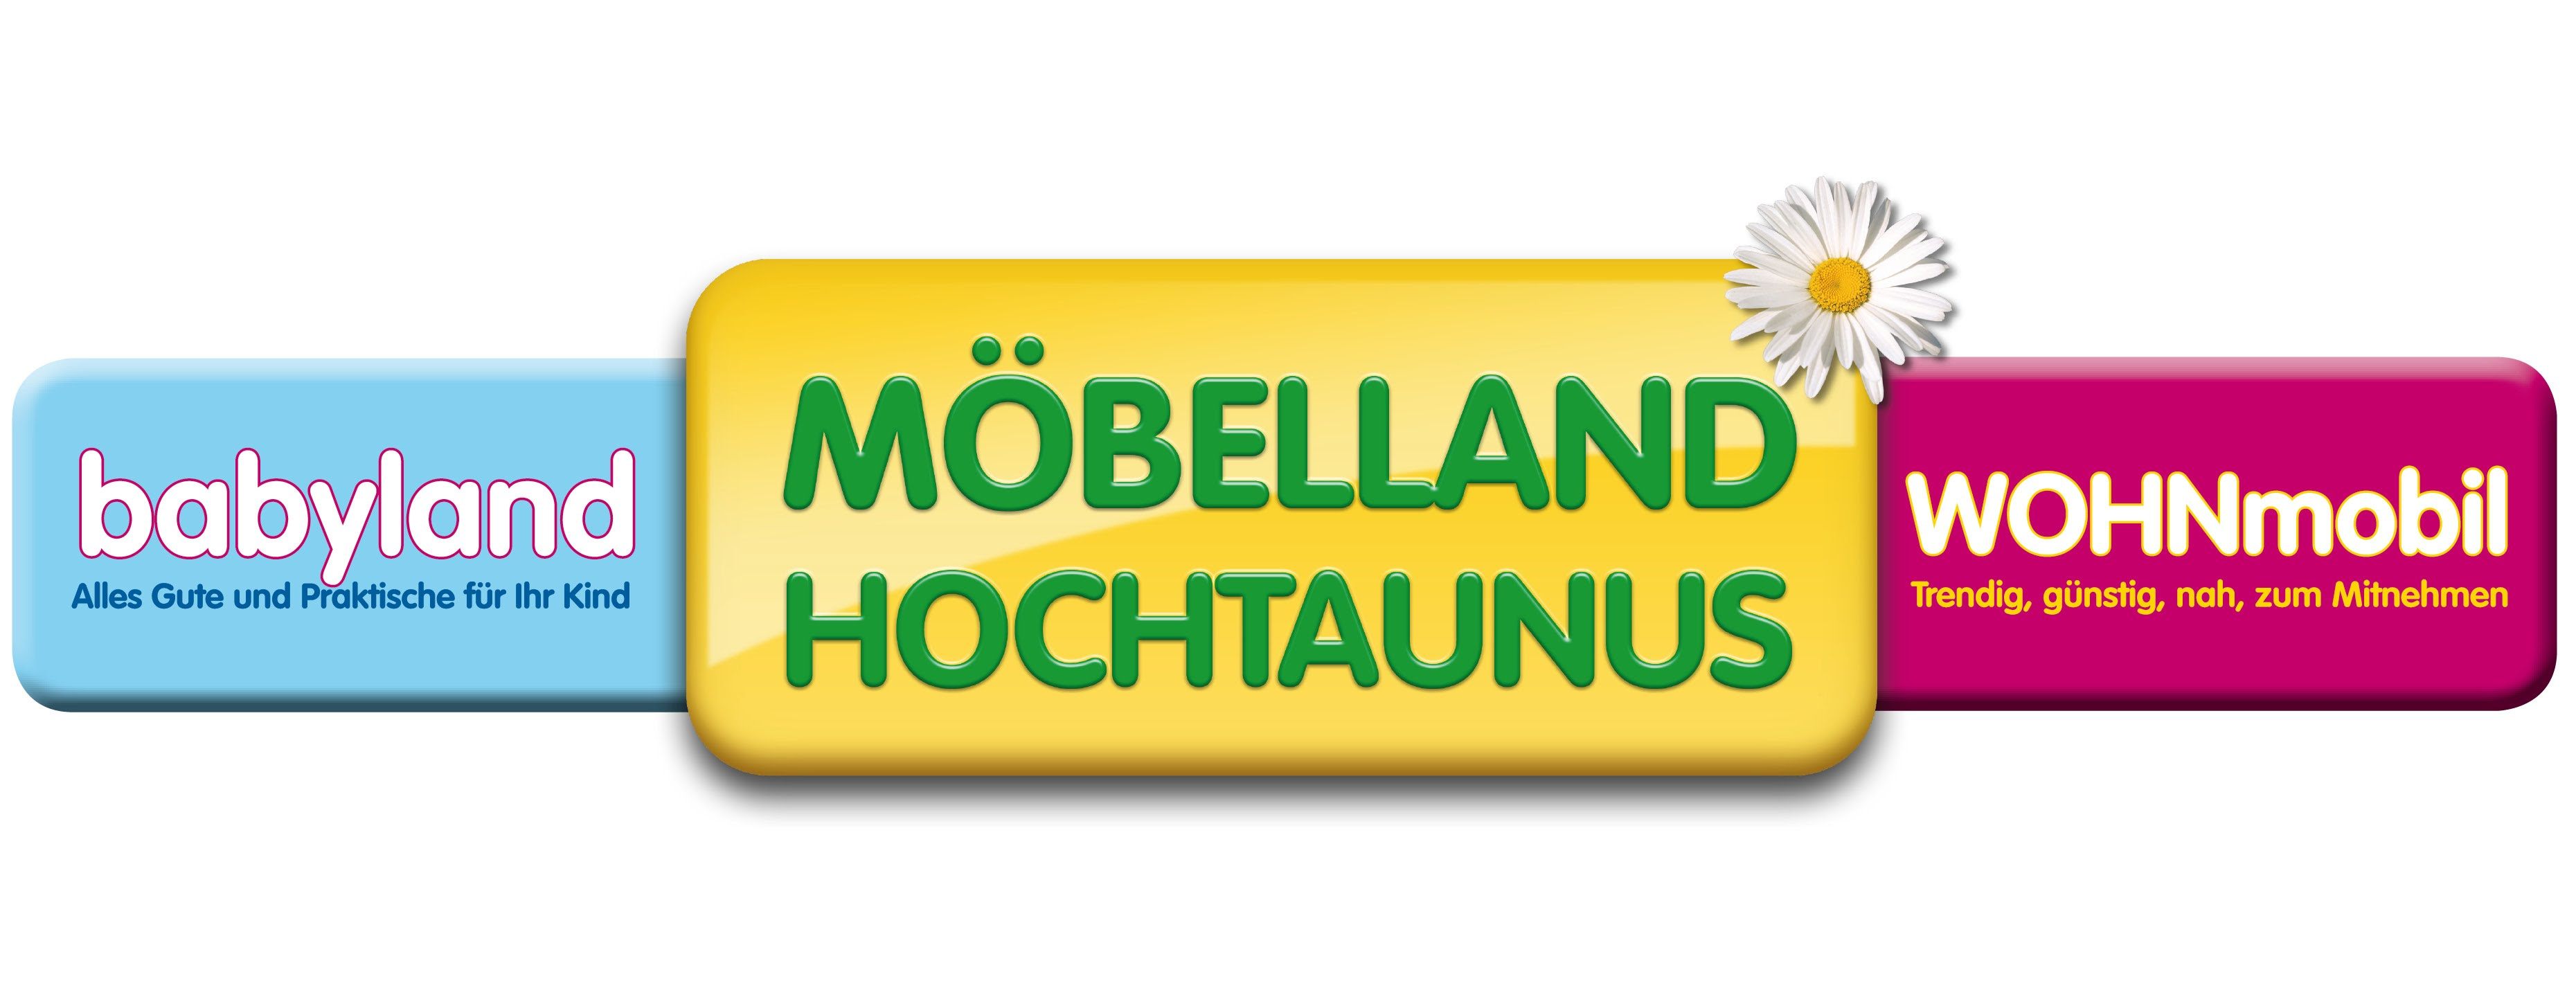 http://www.moebelland.com/